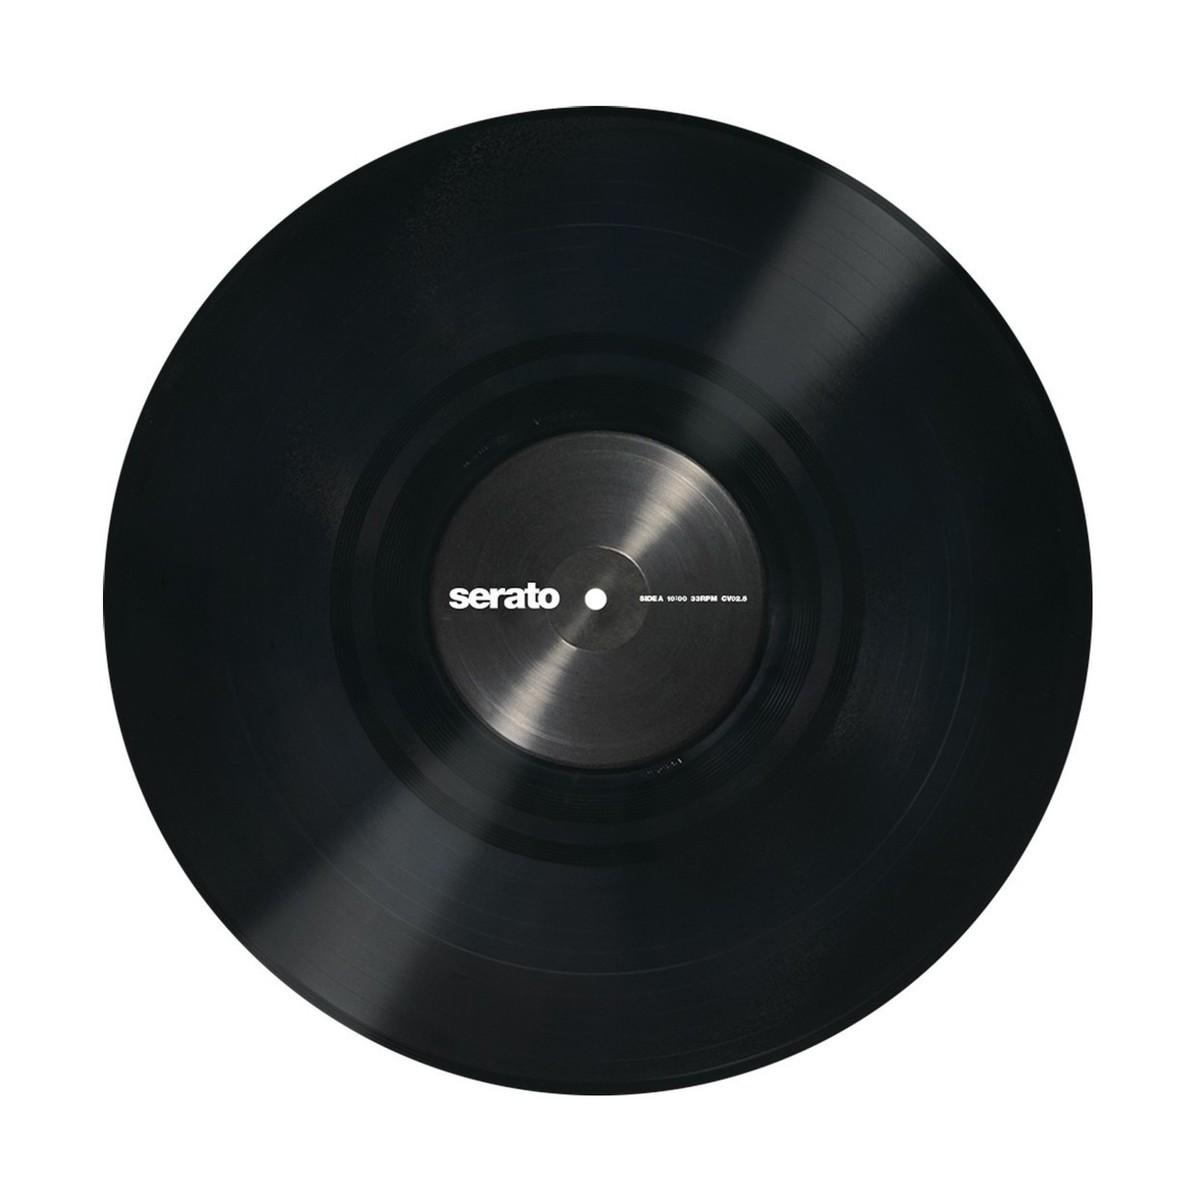 Serato 12 Performance Series Control Vinyl Black